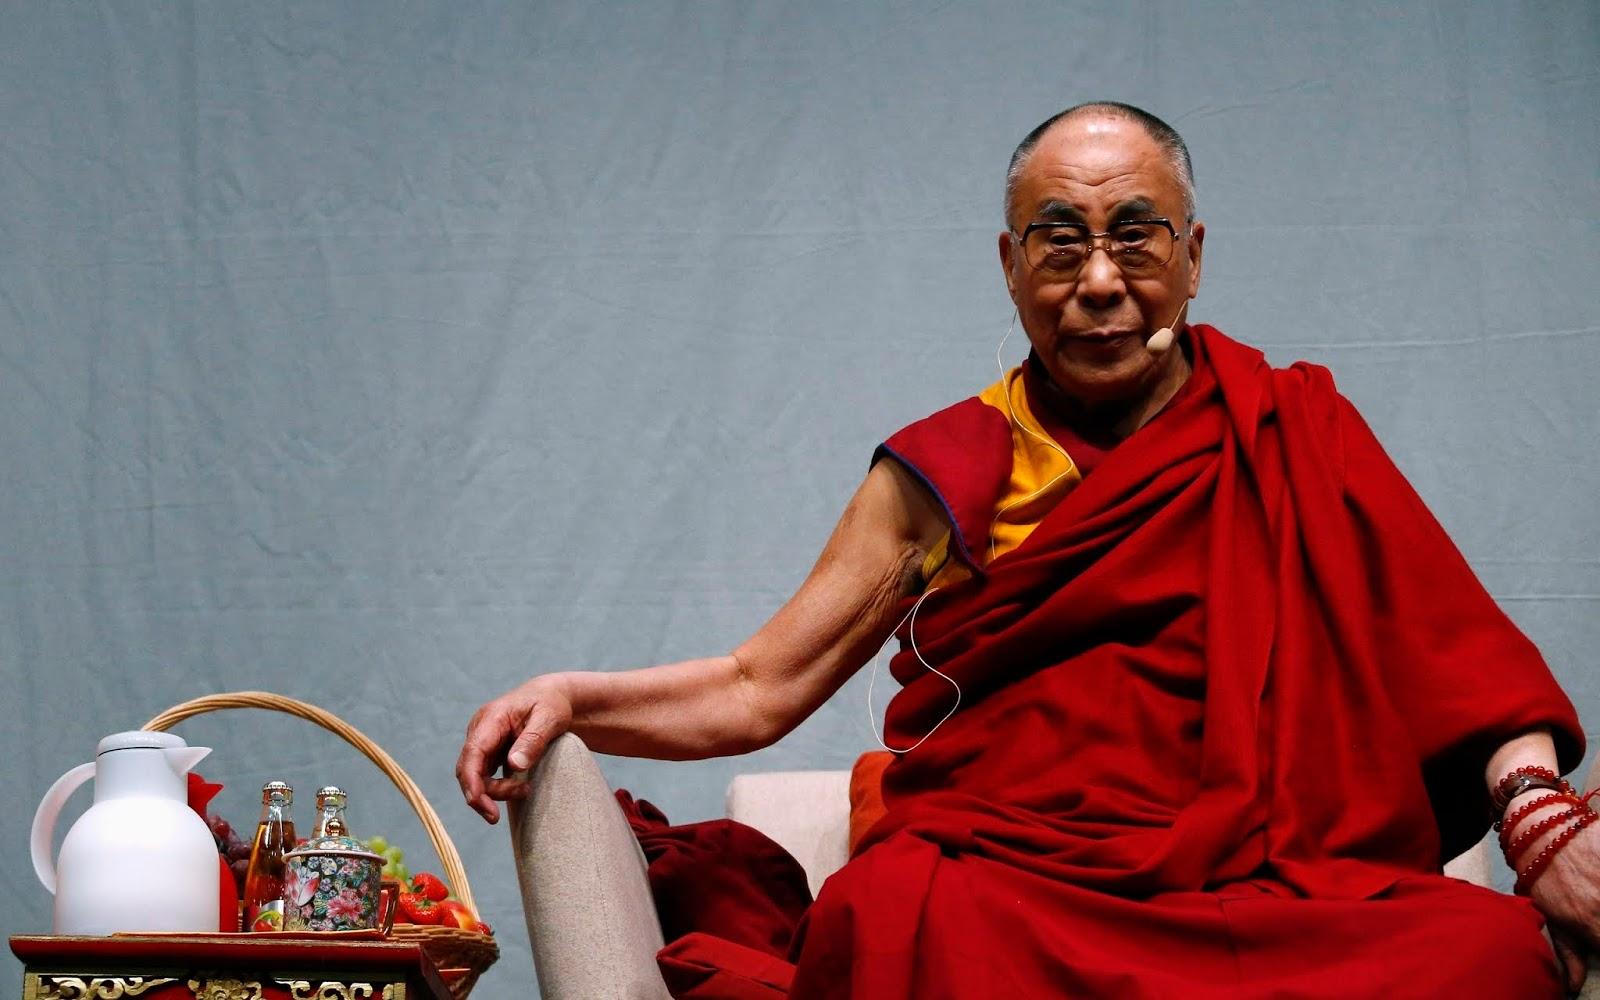 Religion, Tibetan Buddhism, Buddhism, Dalai Lama, Tenzin wallpaper